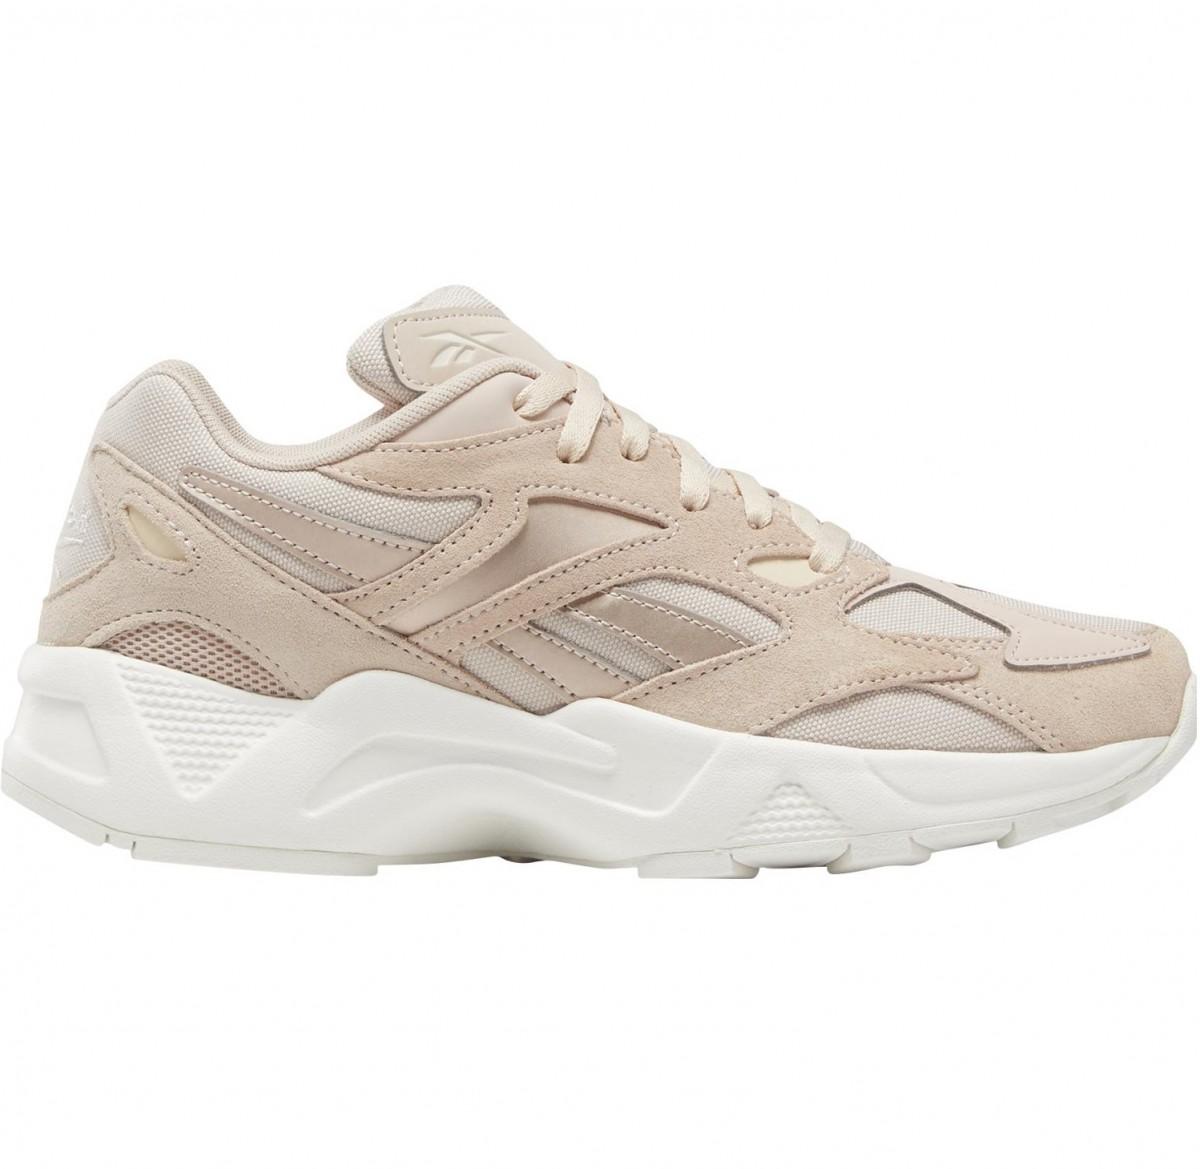 Reebok Classics Aztrek 96 Sneaker